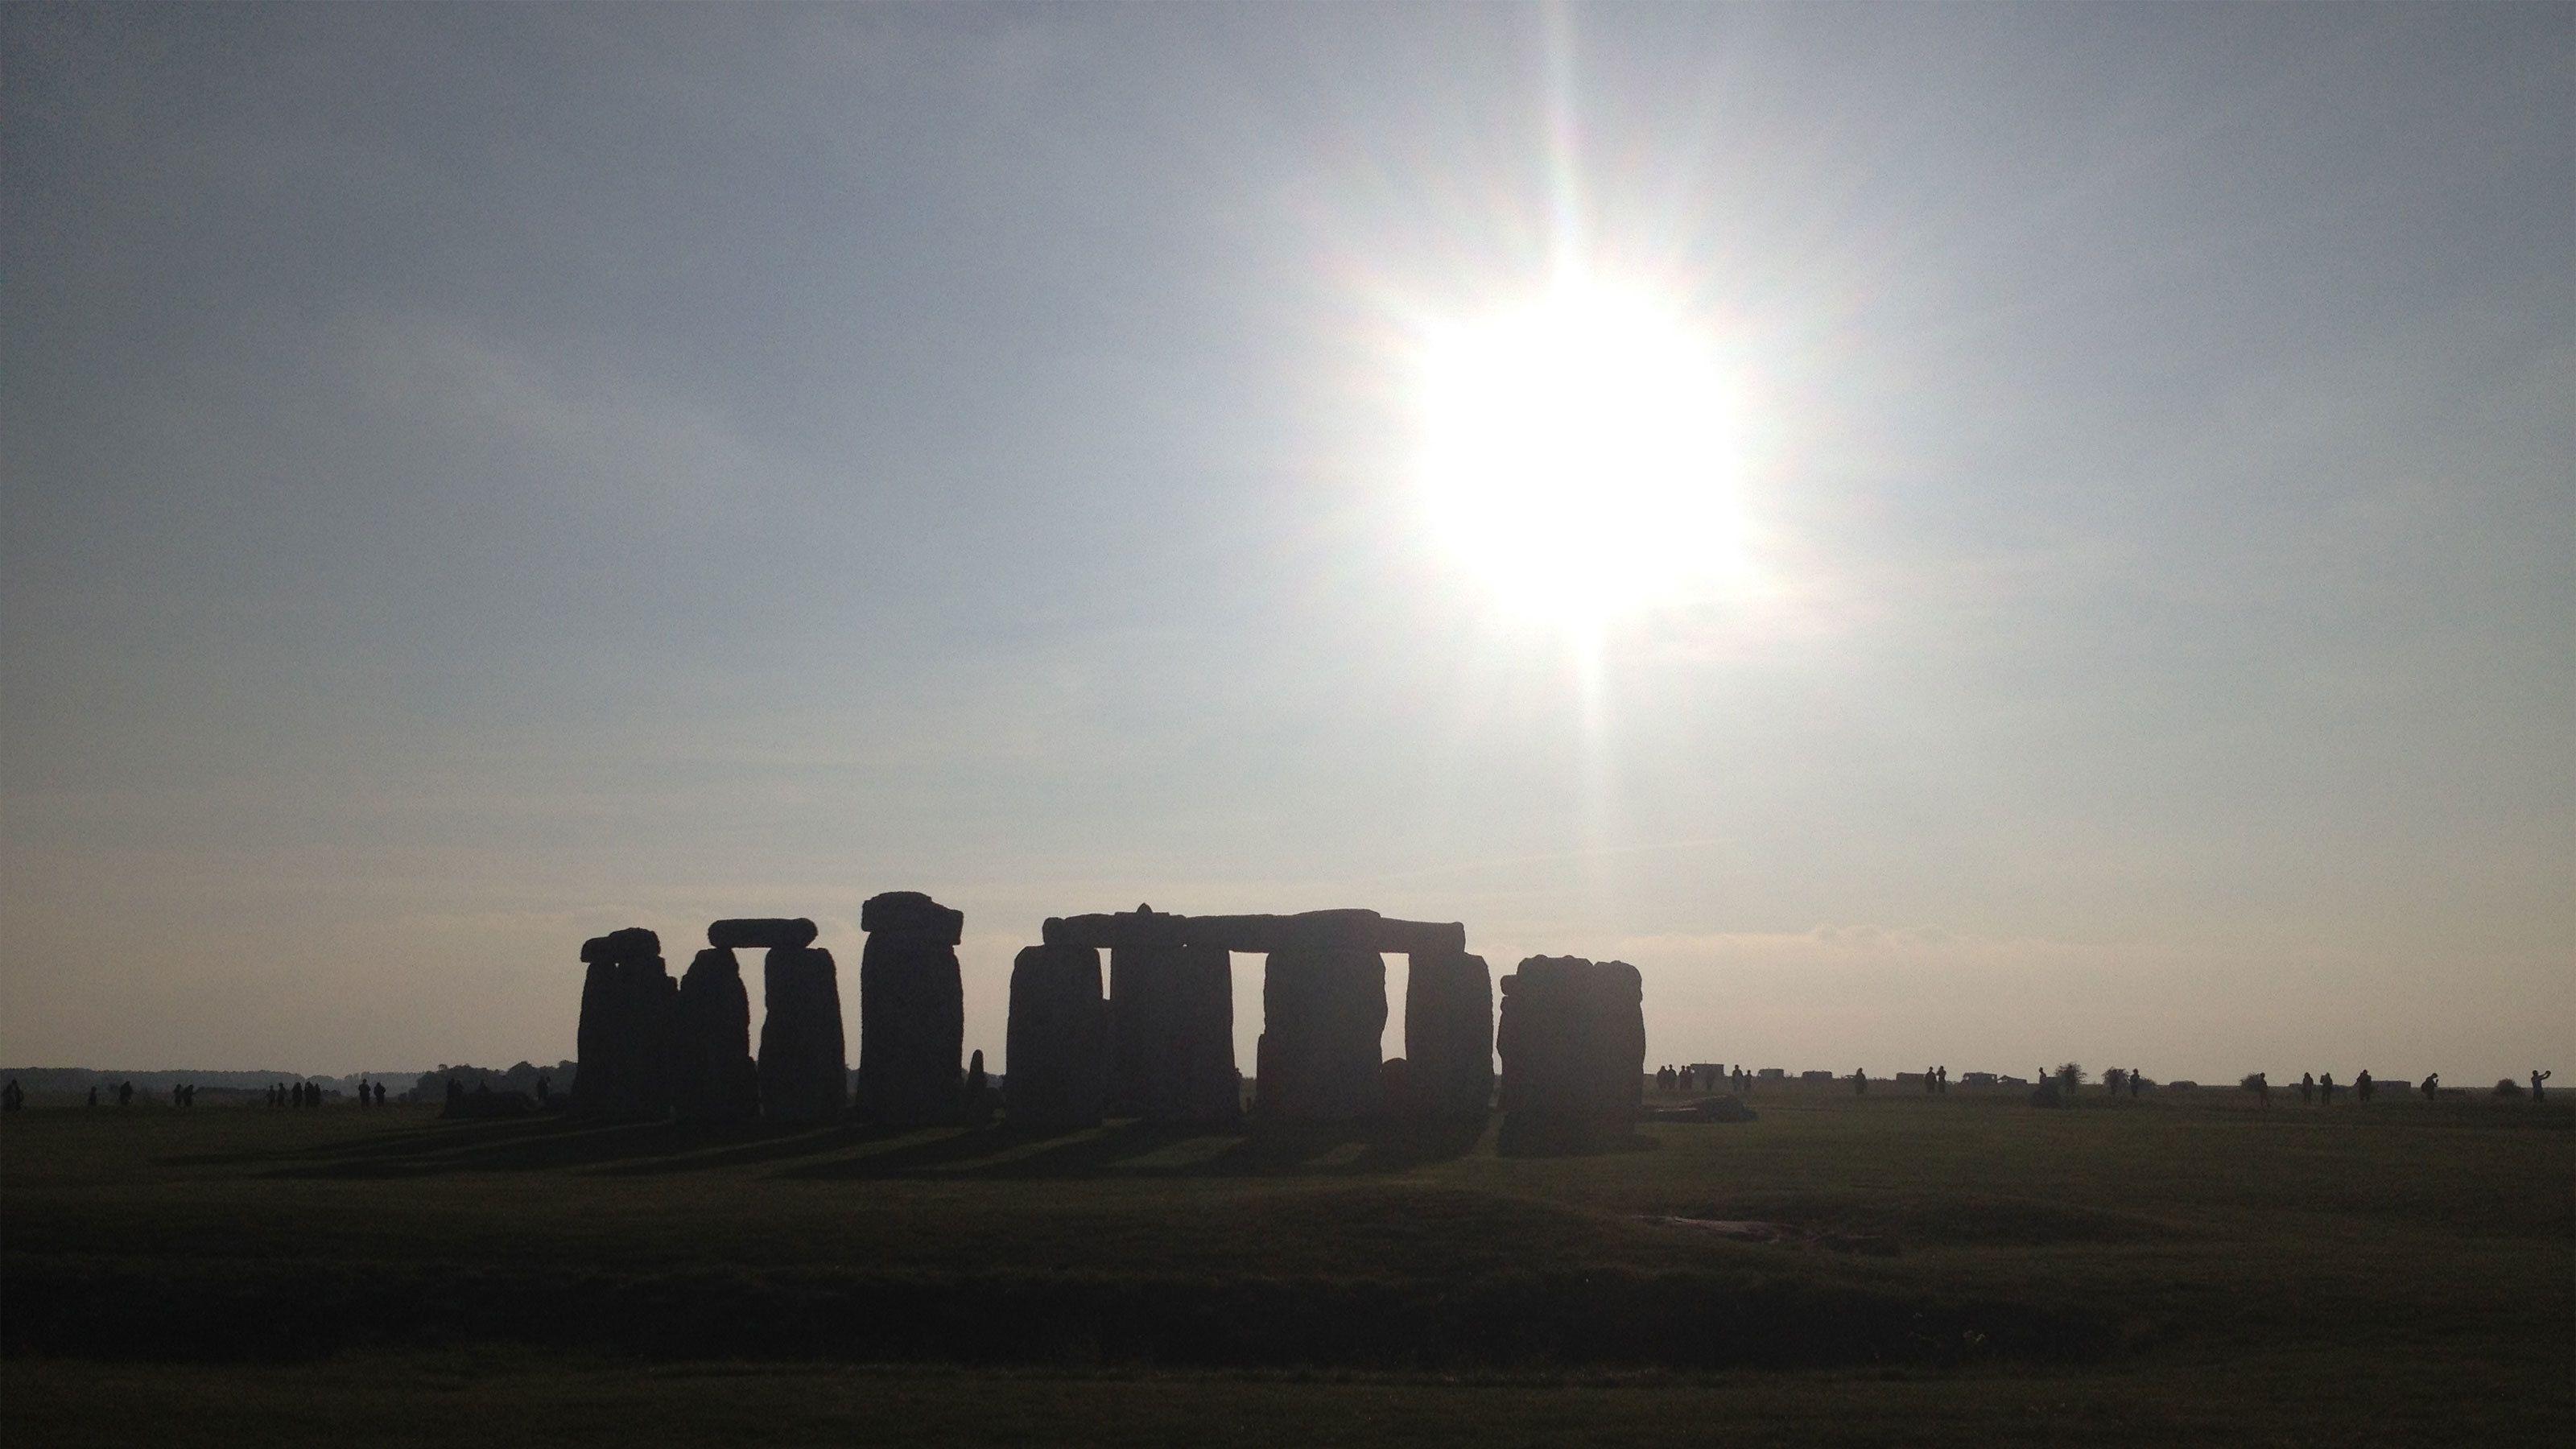 bright sun shining over Stonehenge in London